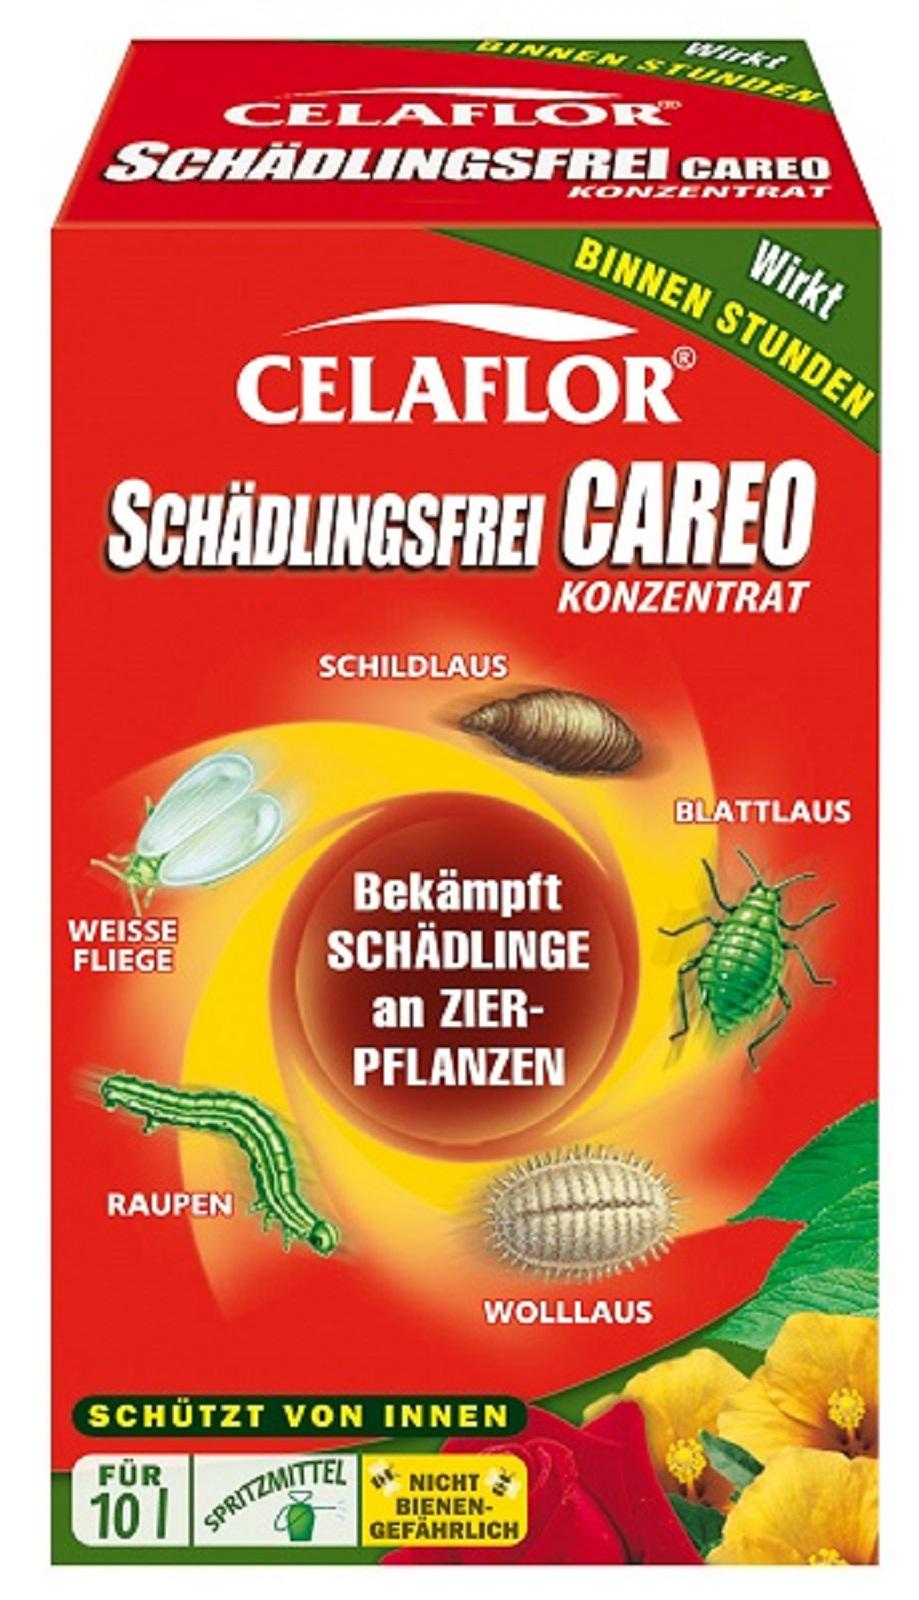 Celaflor Schädlingsfrei Careo Konzentrat Zierpflanzen 100 ml